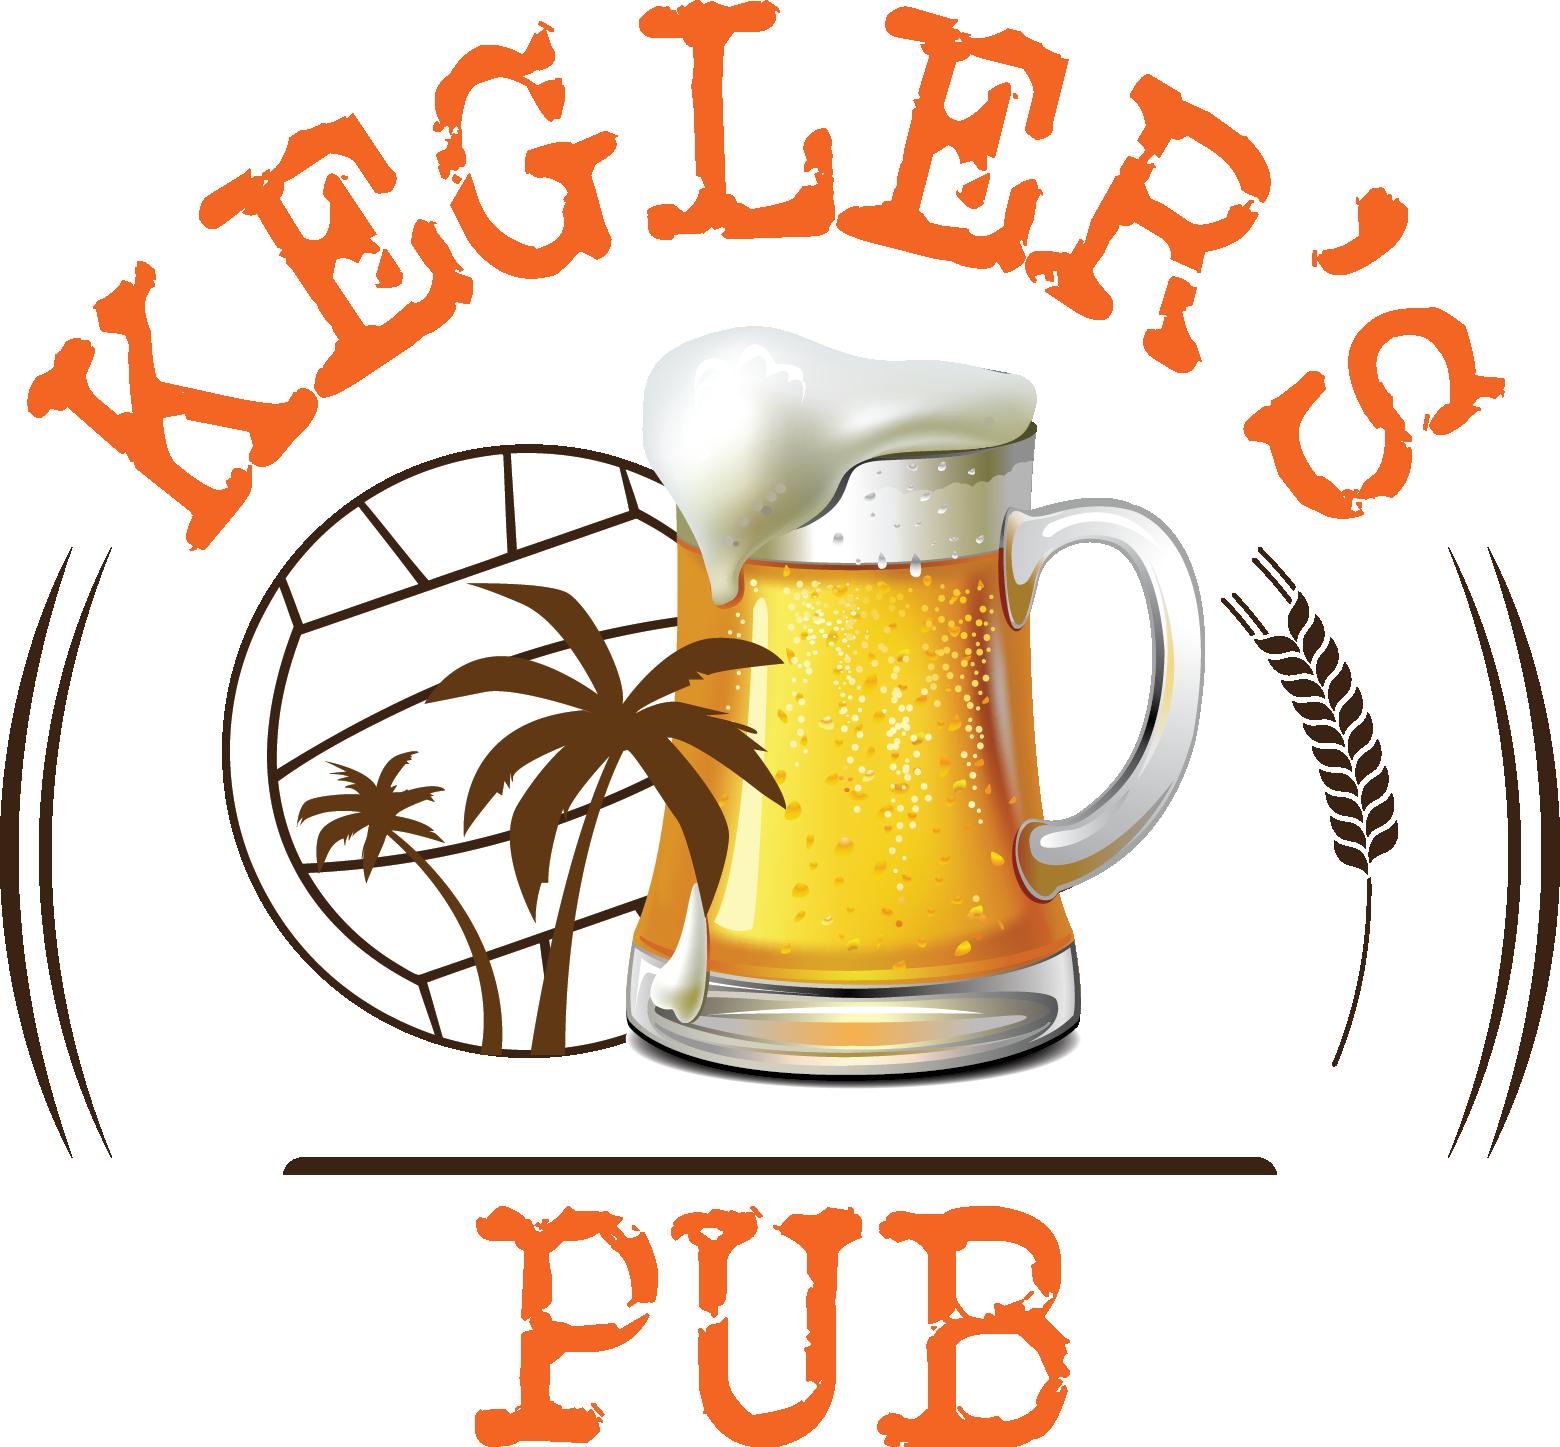 image black and white Kegler s pub pheasant. Karaoke night clipart